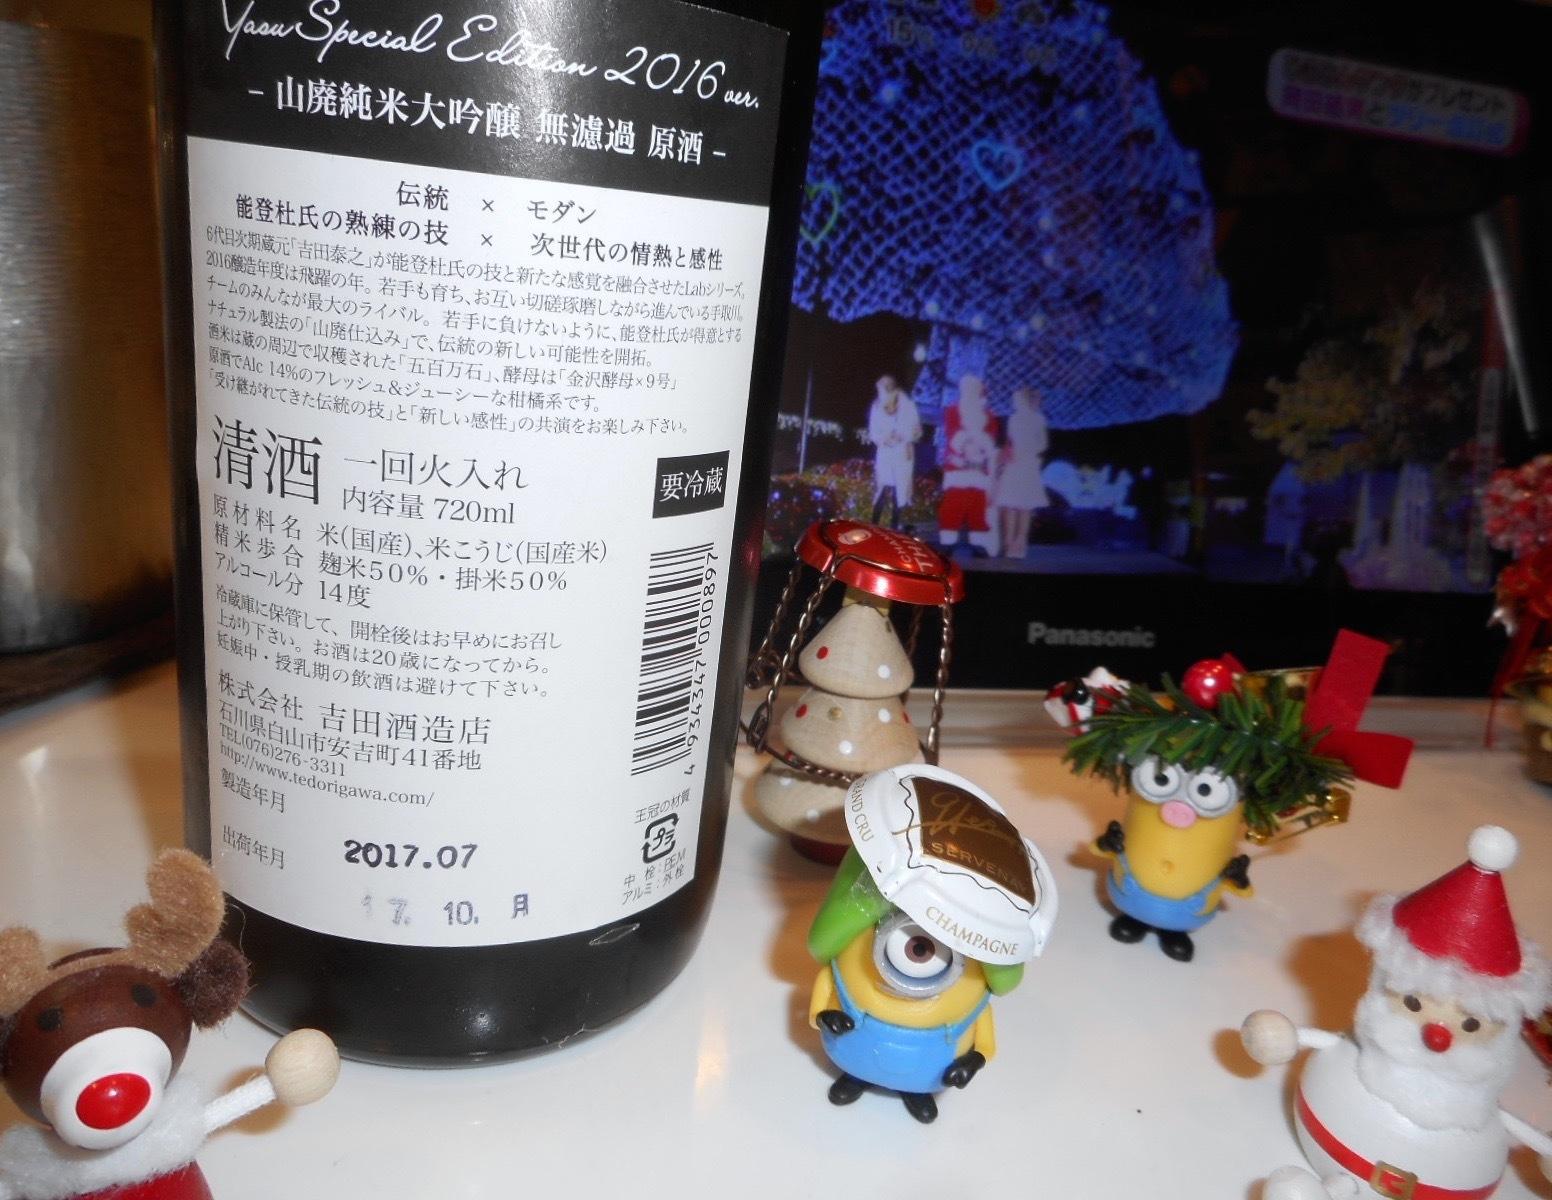 tedorigawa_yasu_special28by2.jpg